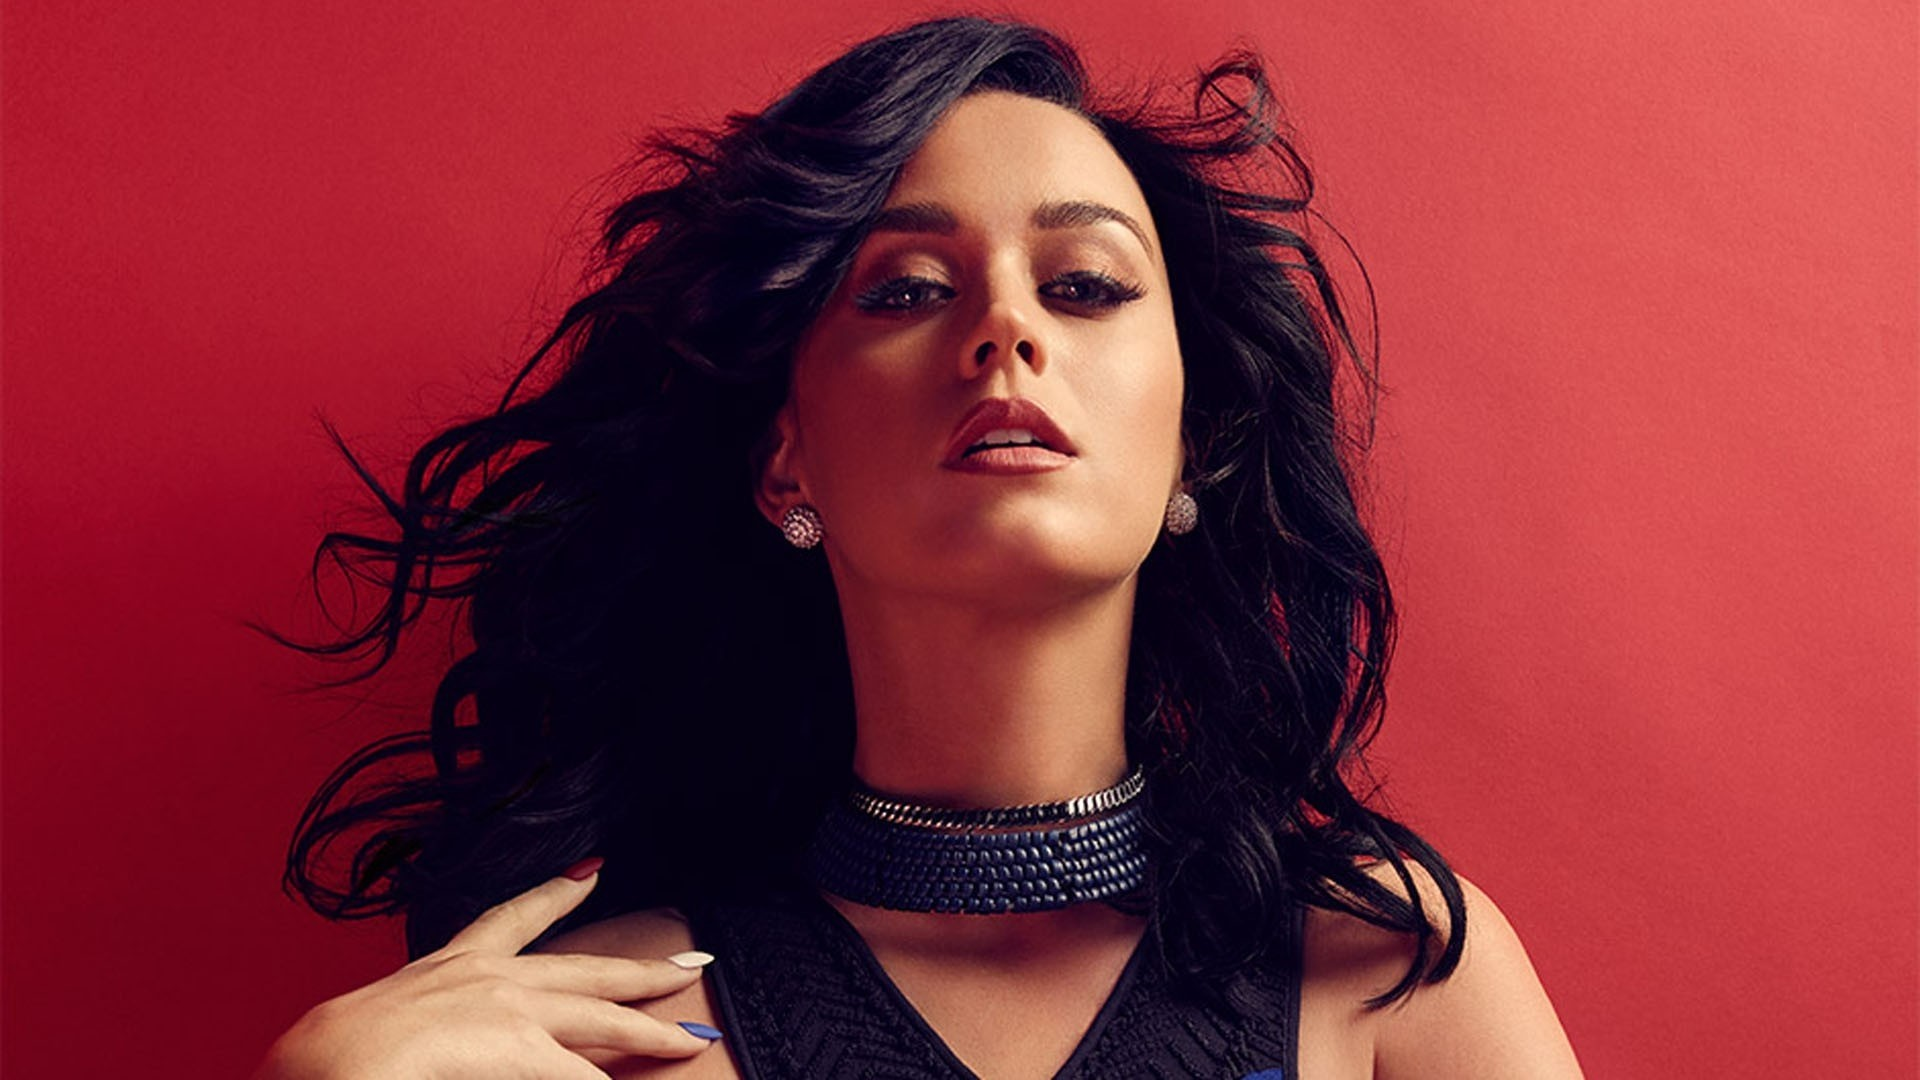 Katy Perry computer wallpaper